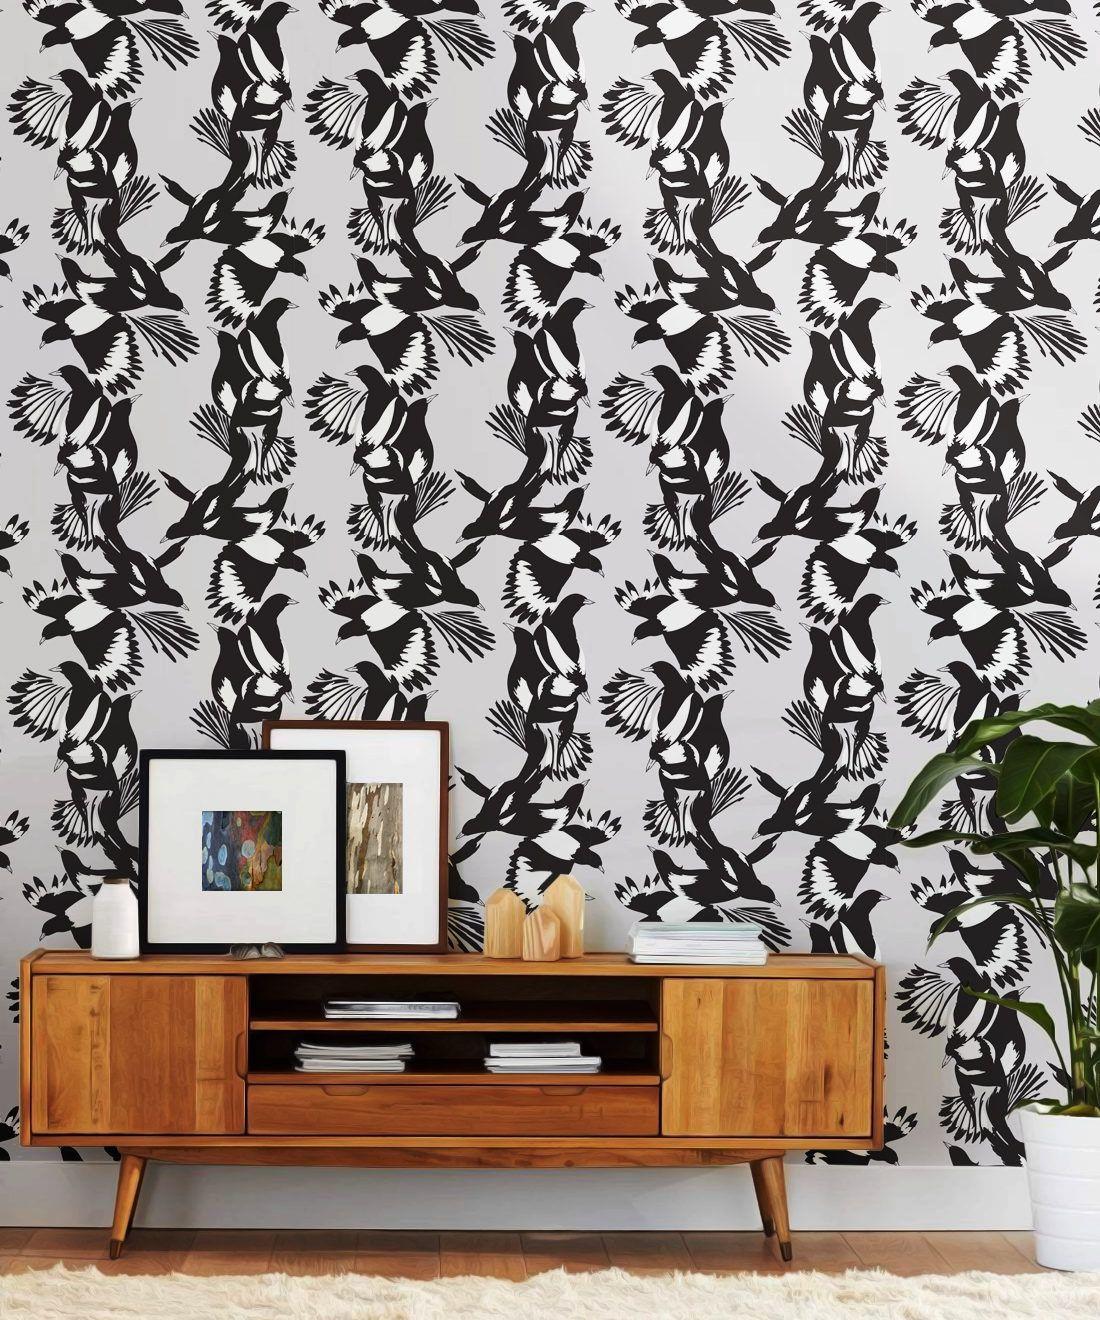 Magpie Wallpaper • Milton & King • Kingdom Home • Bird Wallpaper • Black & White Insitu